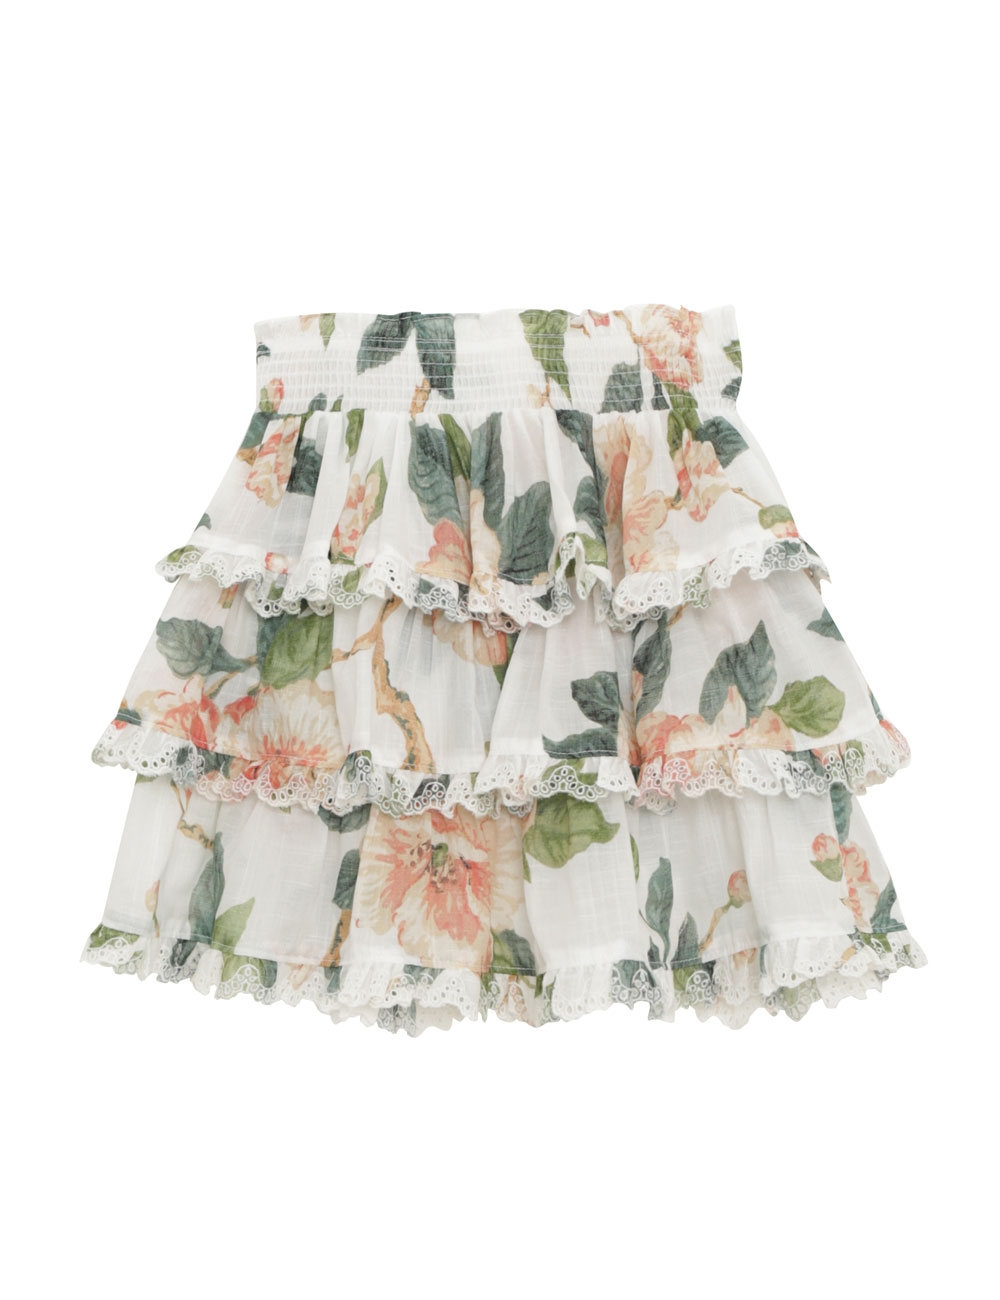 Kirra Tiered Trim Skirt